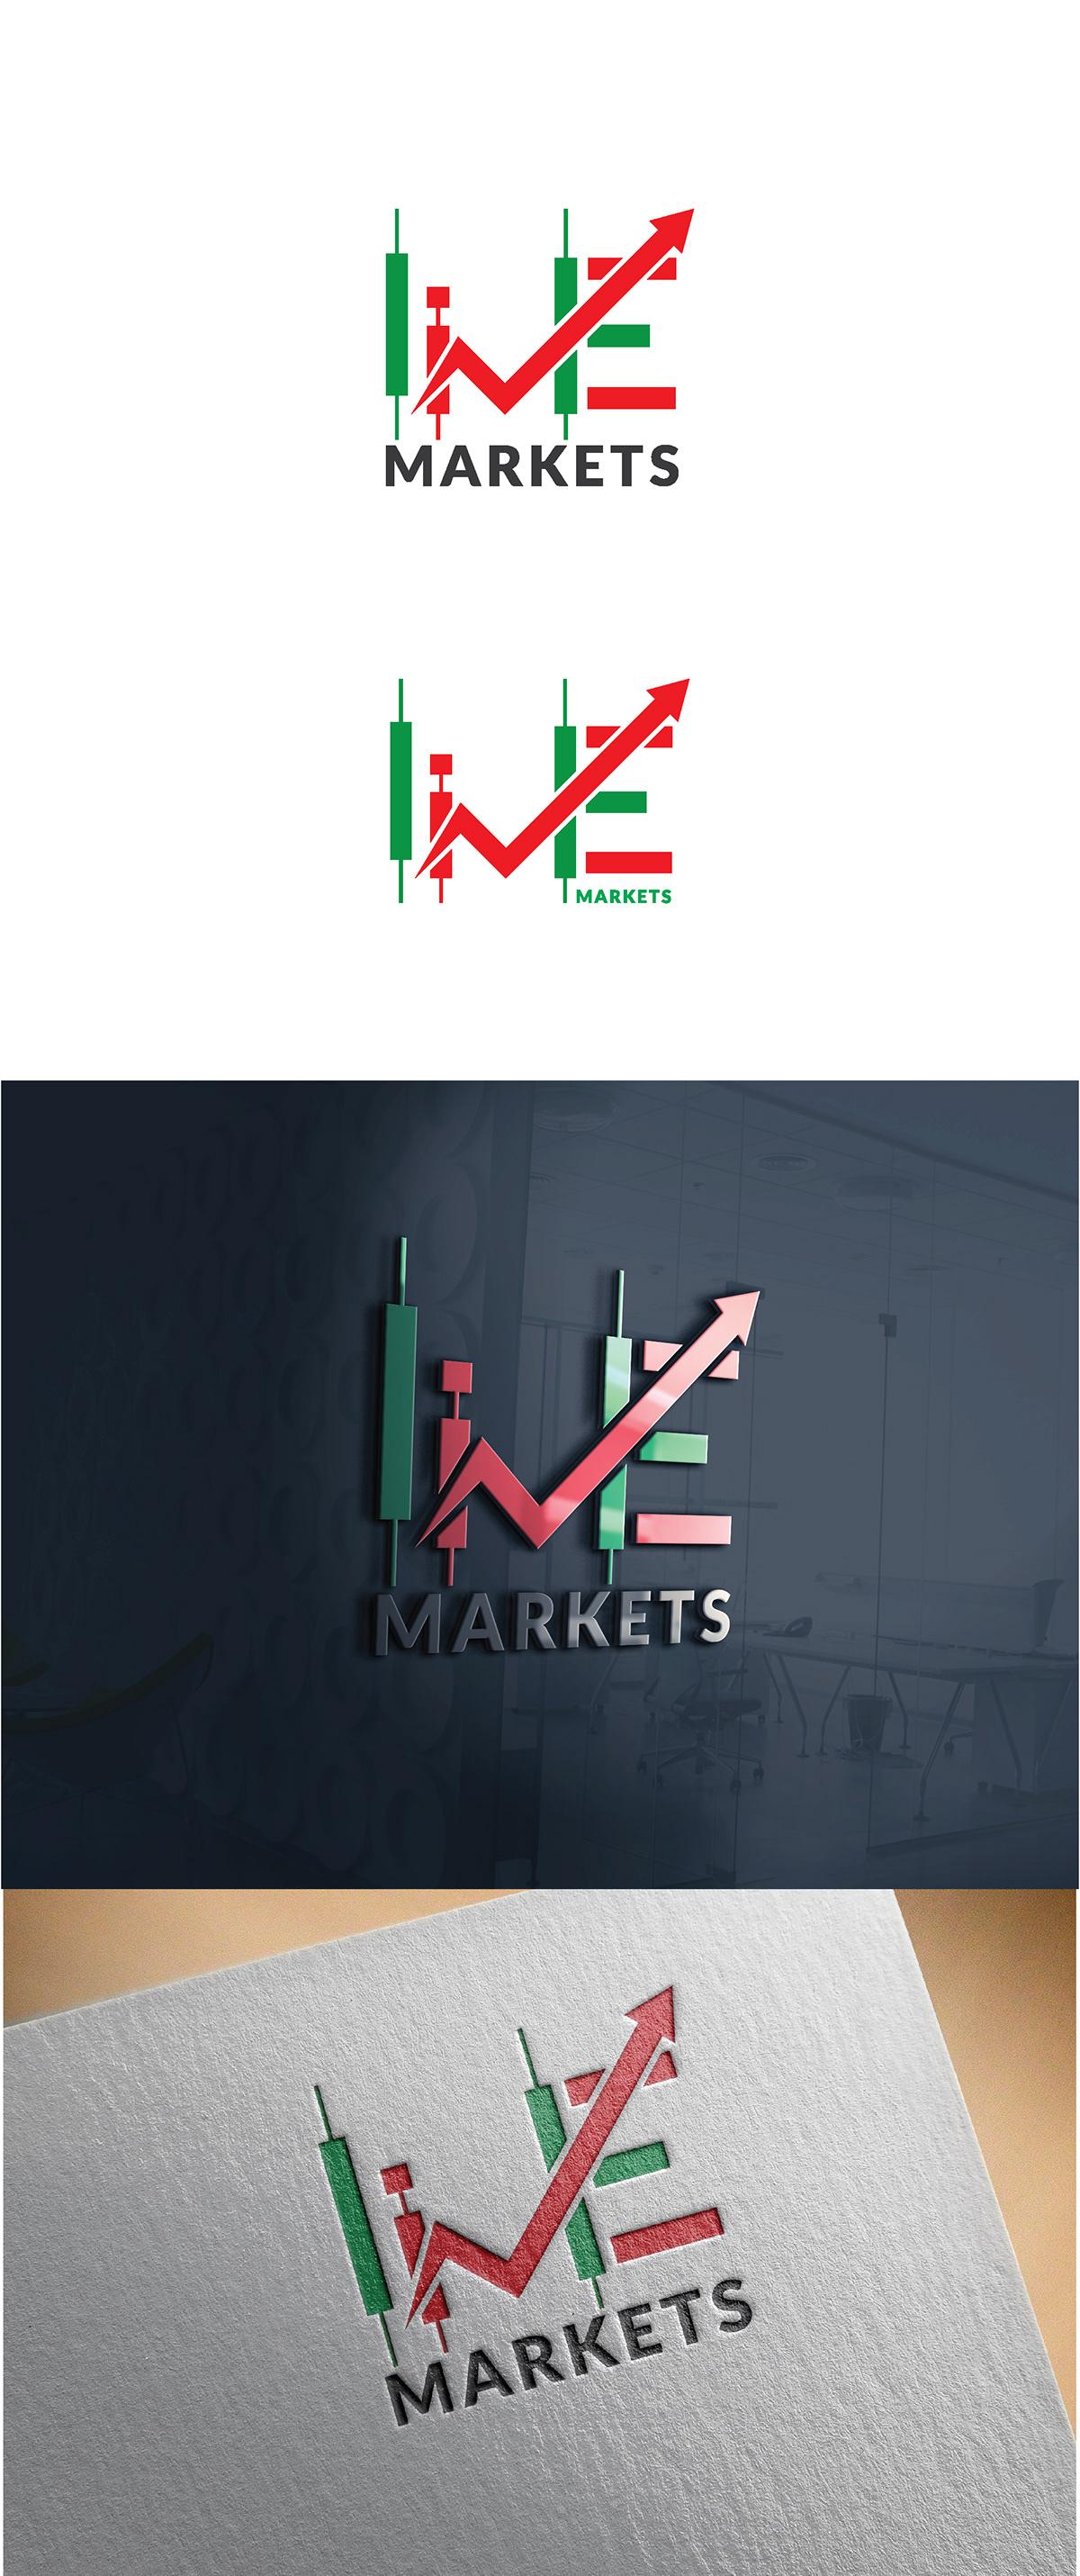 Live Market Forex Logo Design Idea on Pantone Canvas Gallery